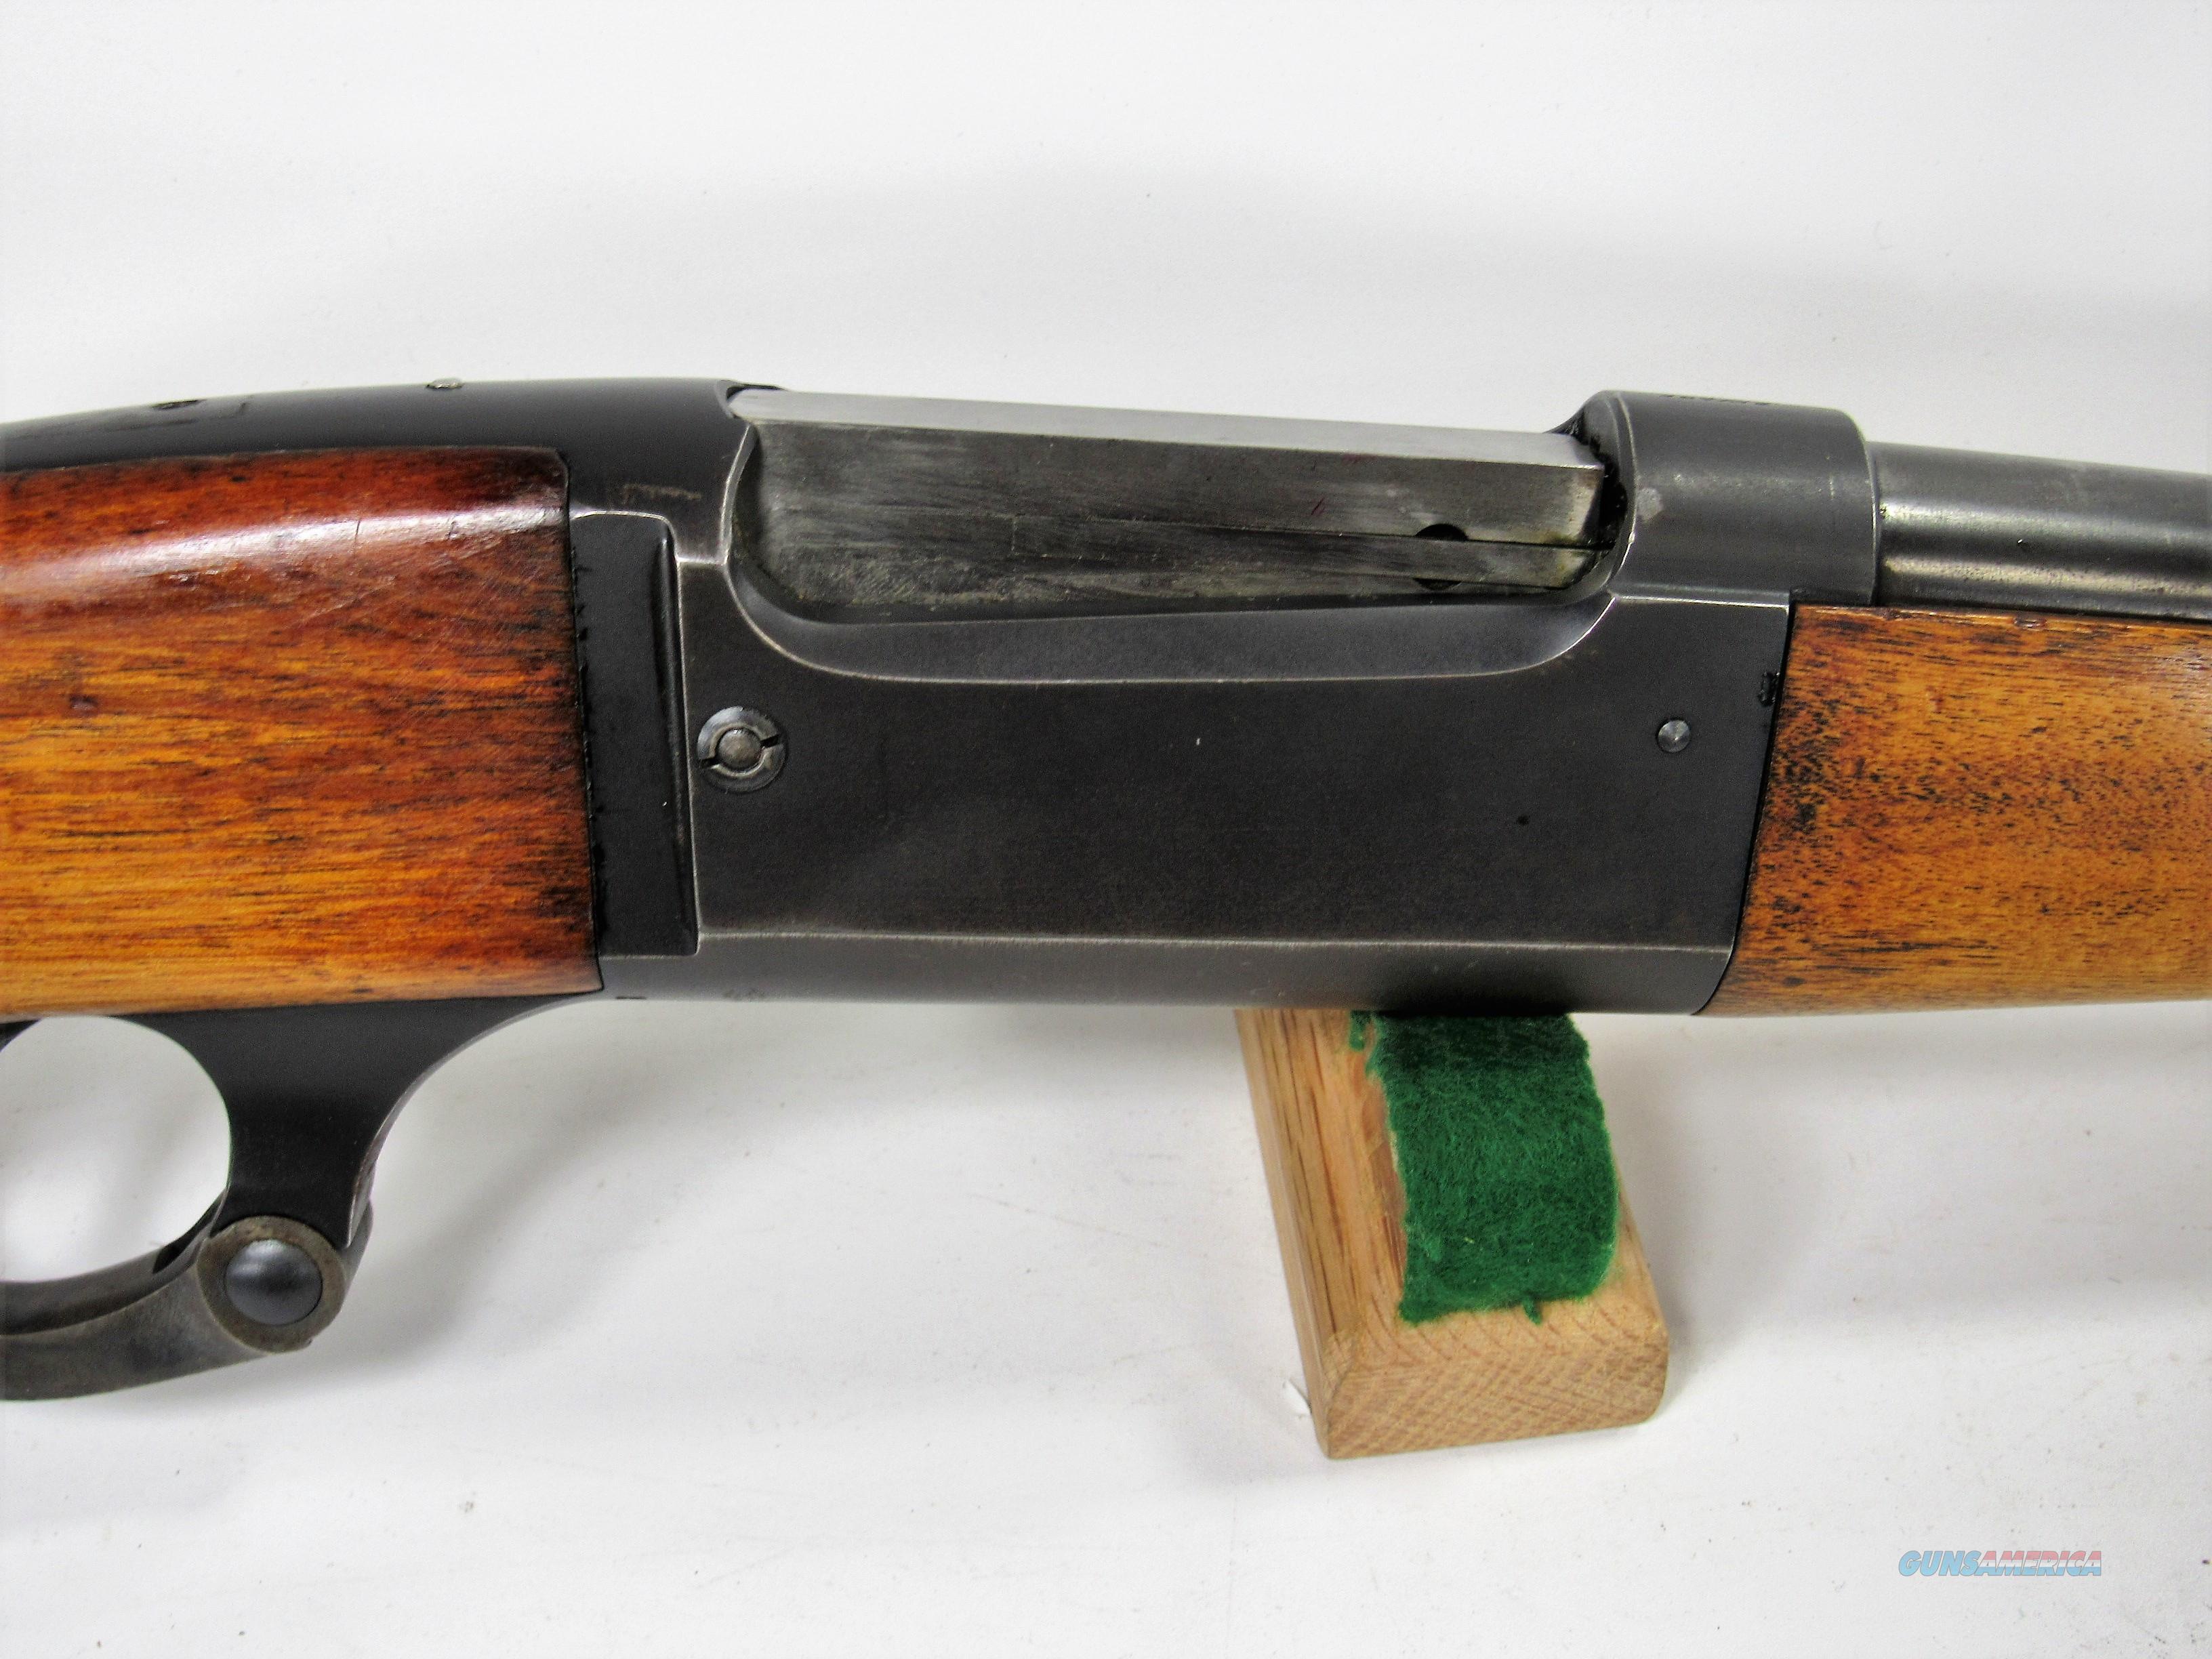 260Q SAVAGE 1899H CARBINE 303  Guns > Rifles > Savage Rifles > Model 95/99 Family